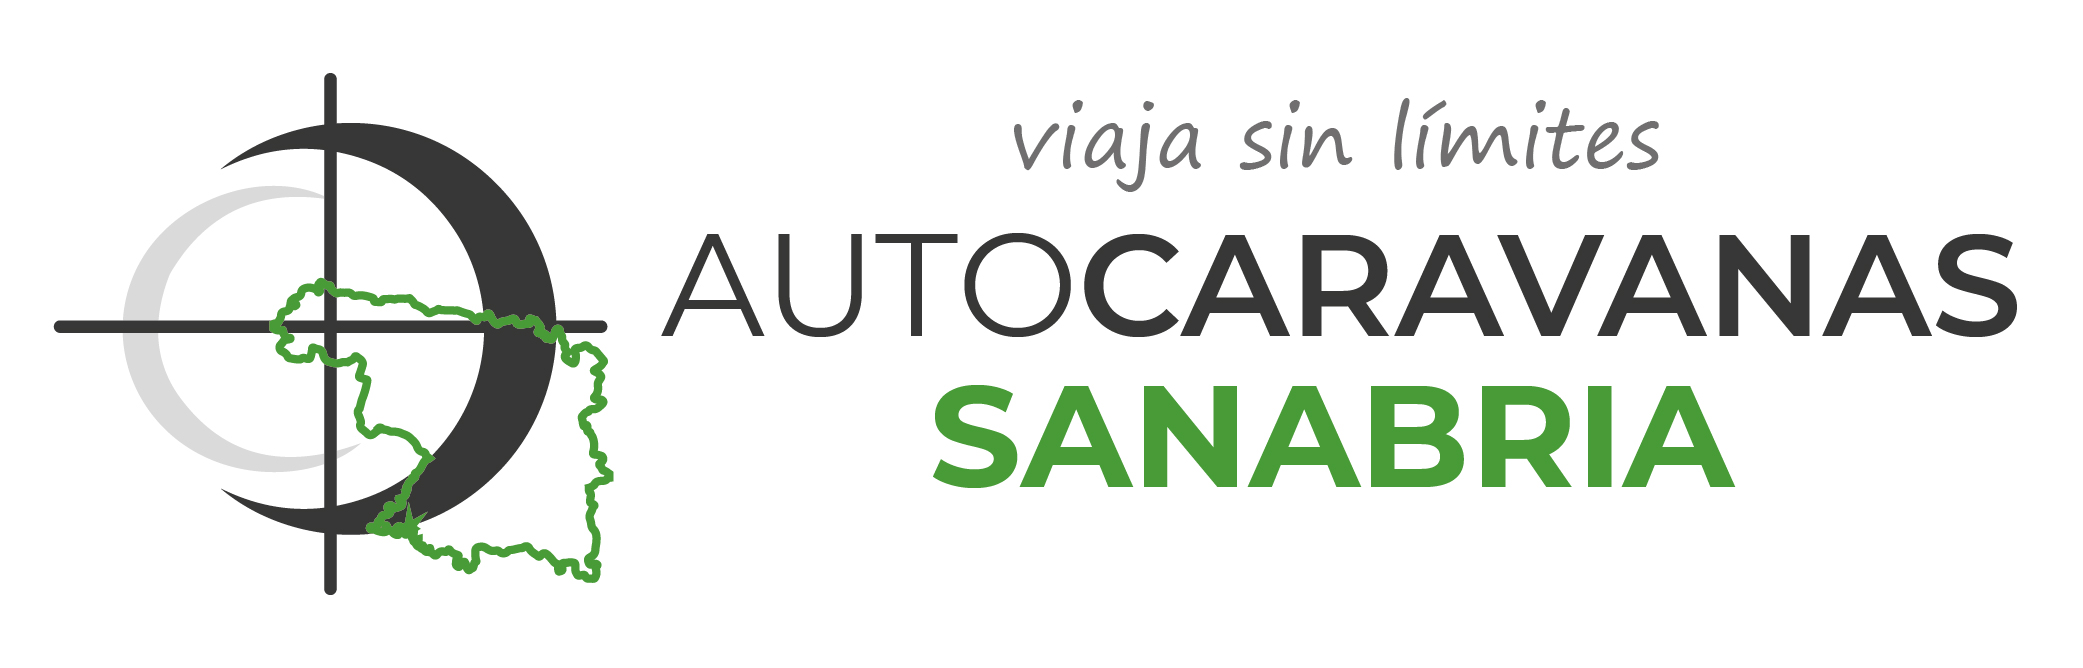 Autocaravanas Sanabria